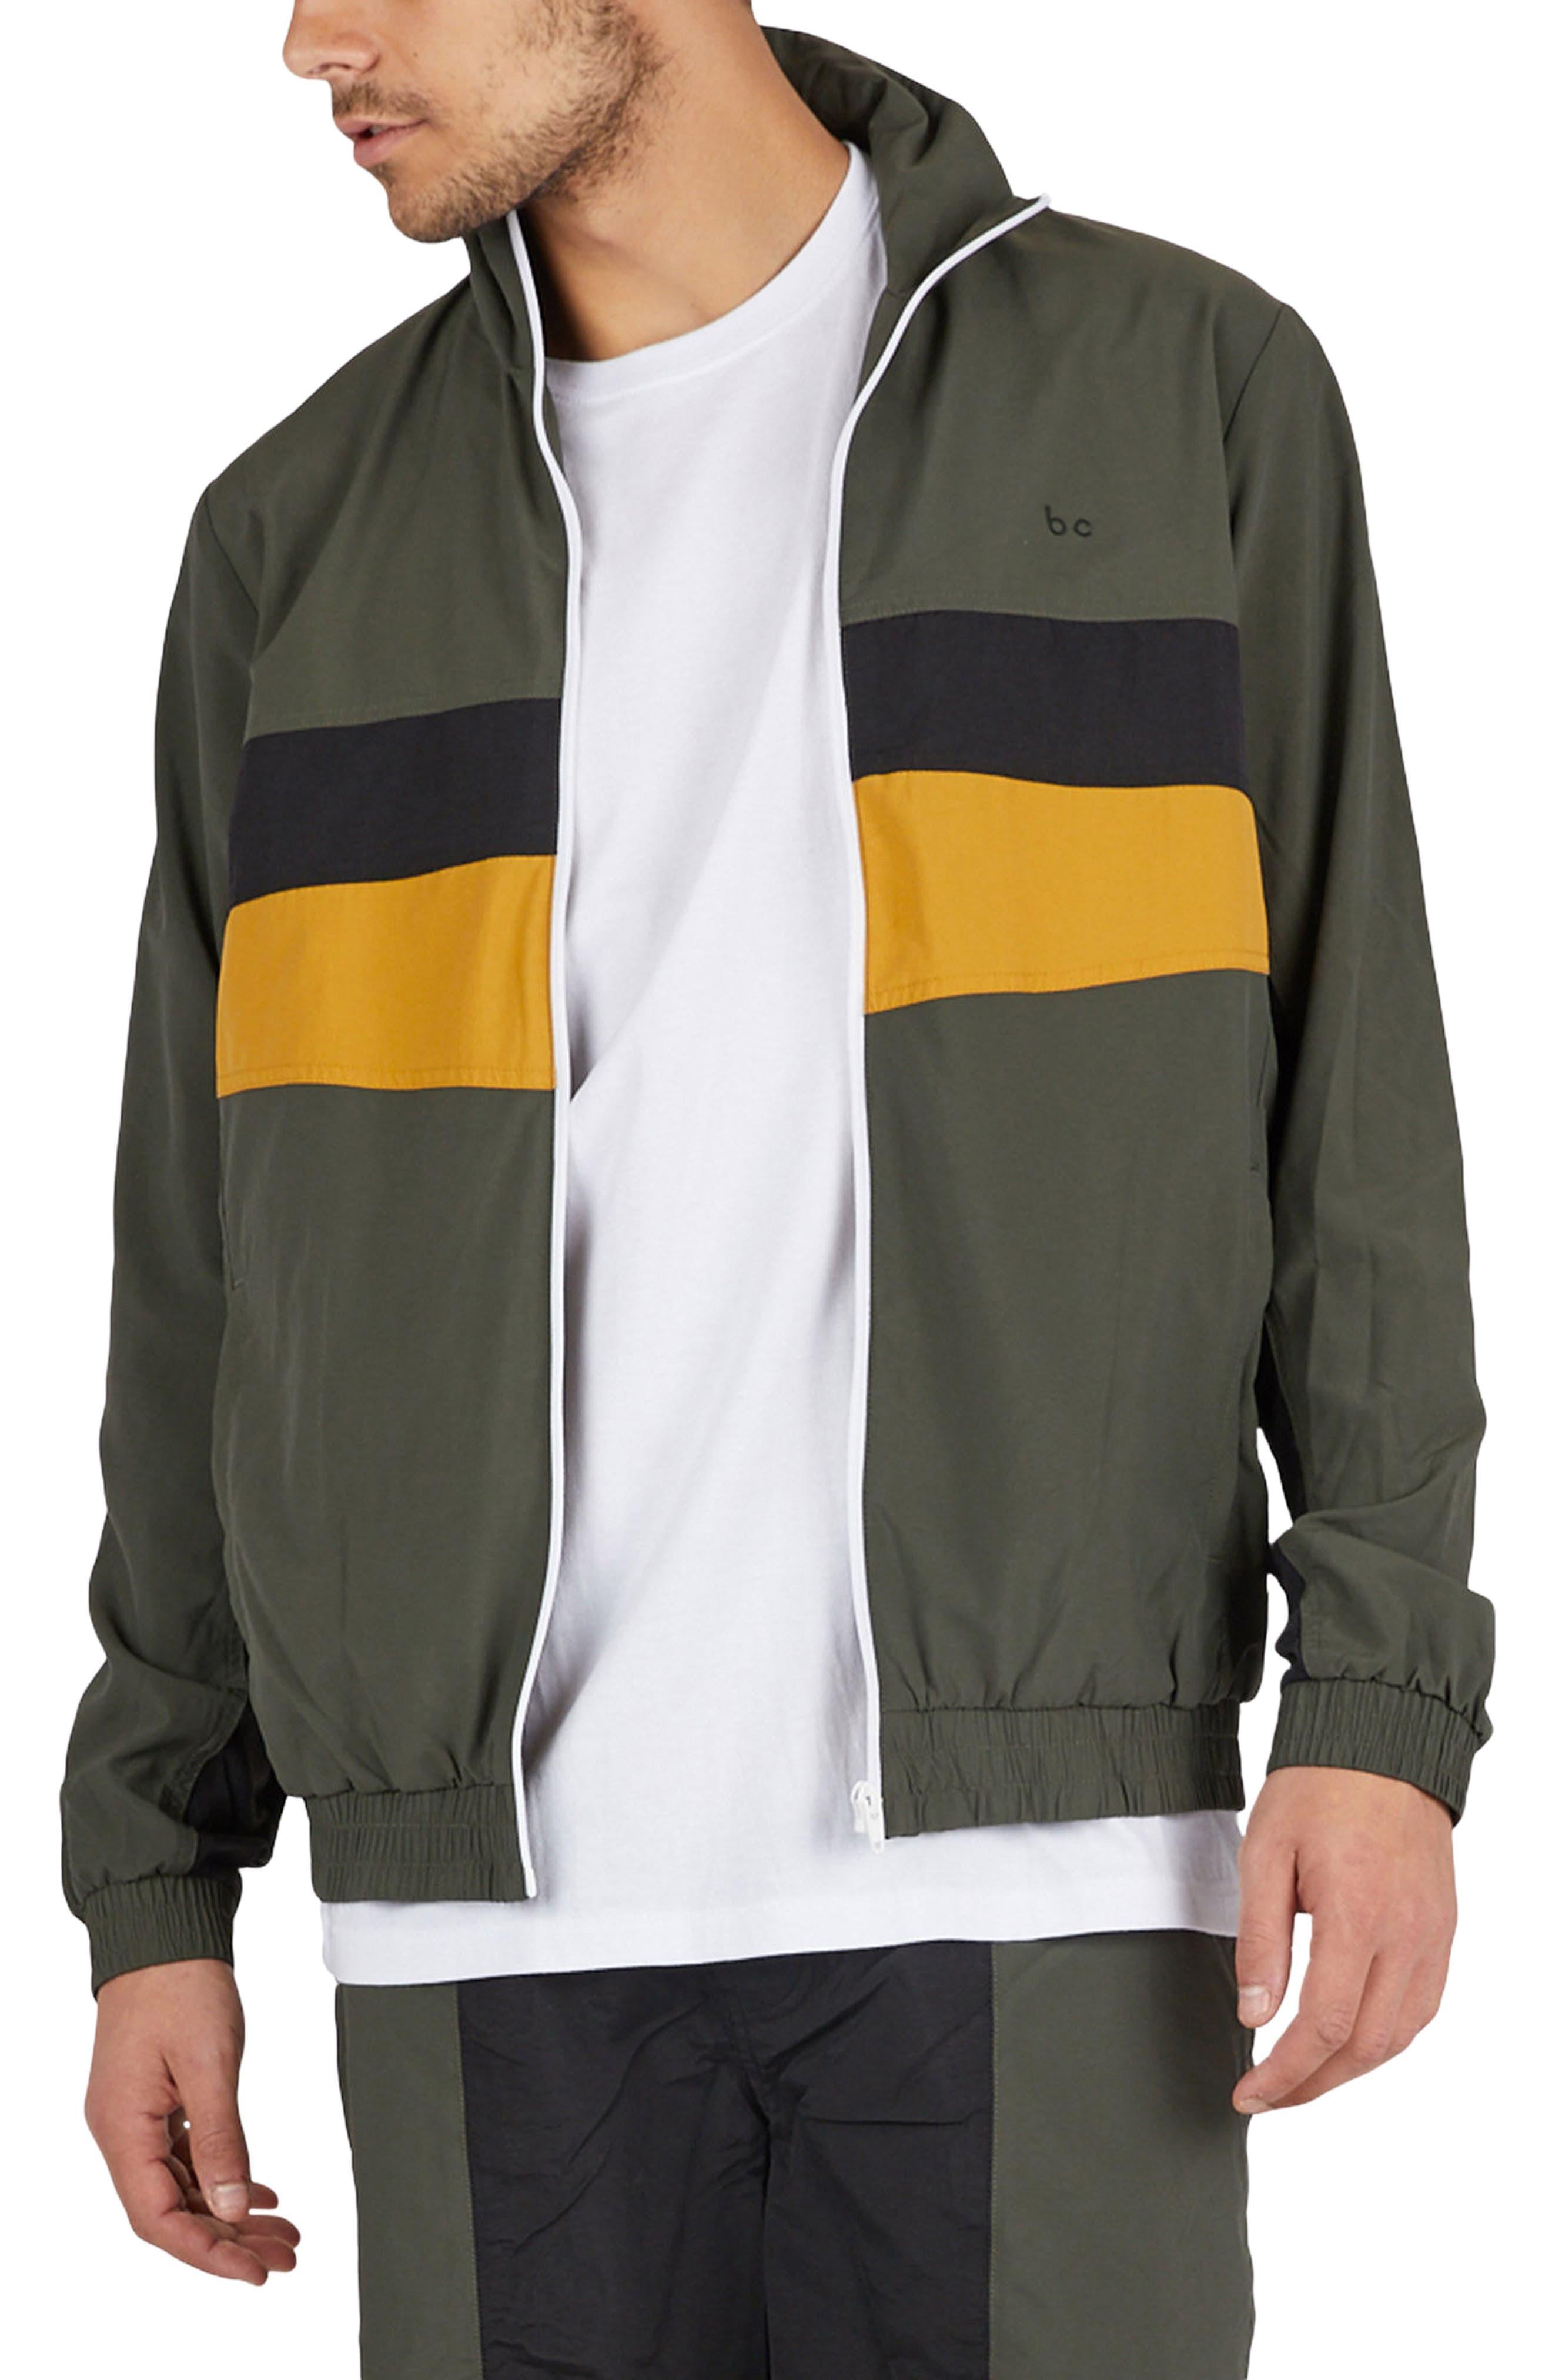 Barney Cools B. Quick Track Jacket